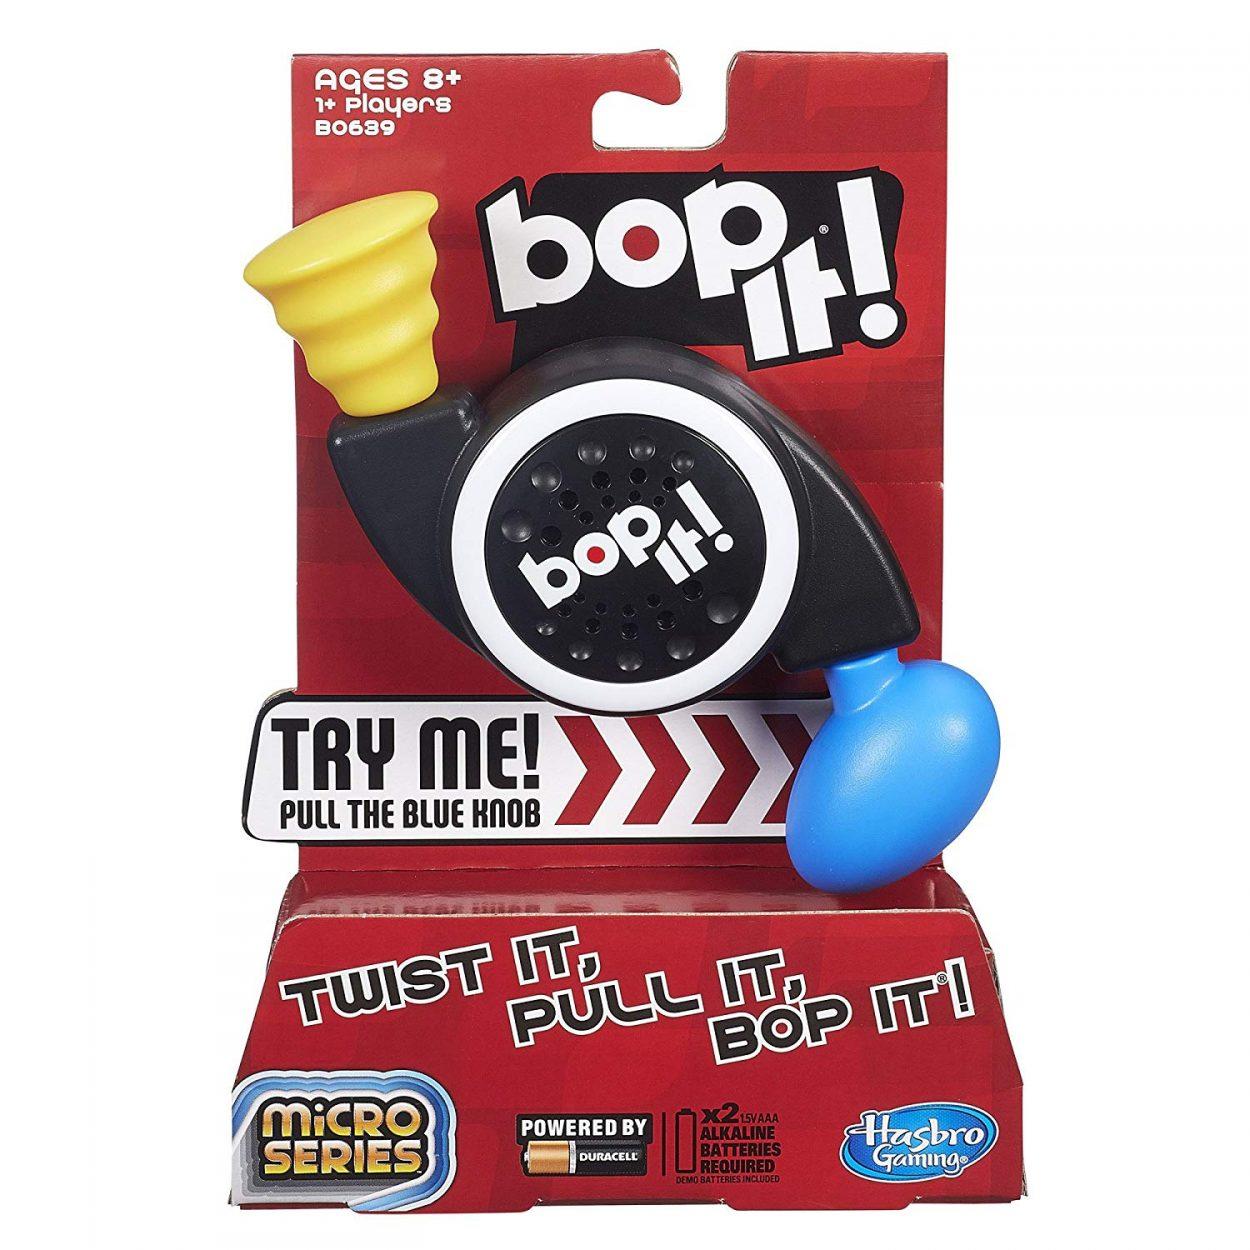 Micro Series Bop It!